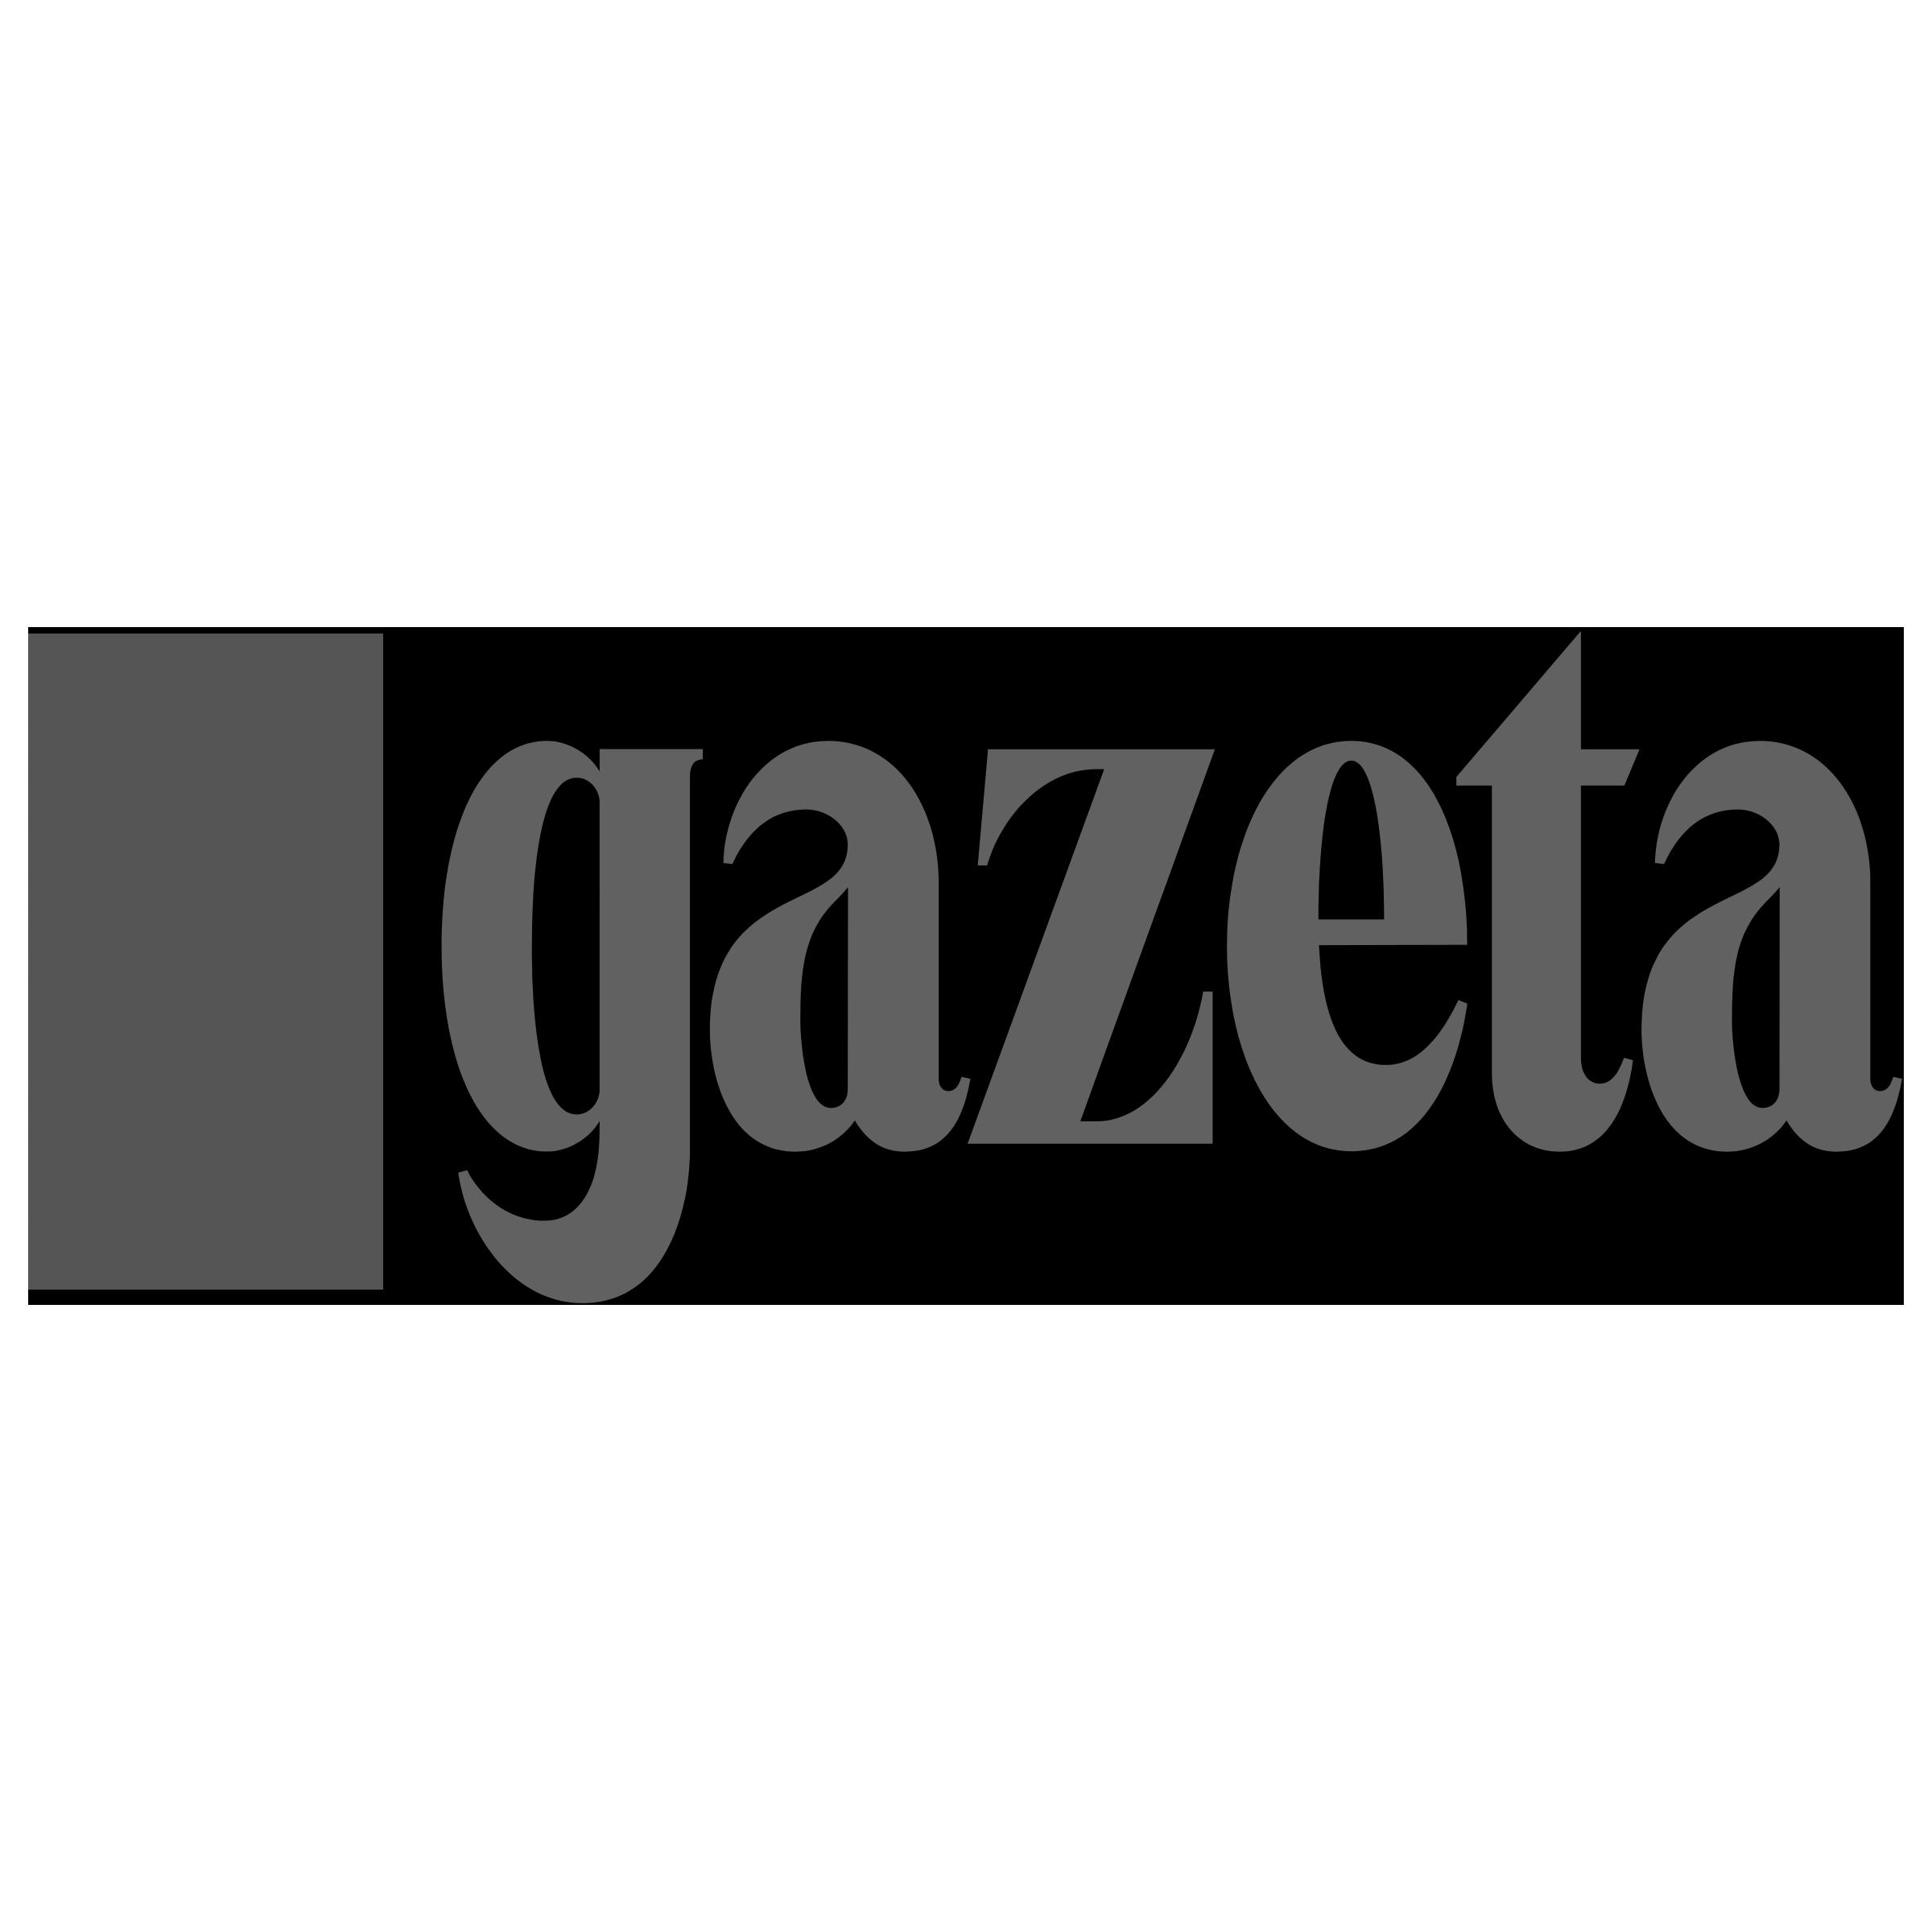 gazeta-wyborcza-logo-png-transparent